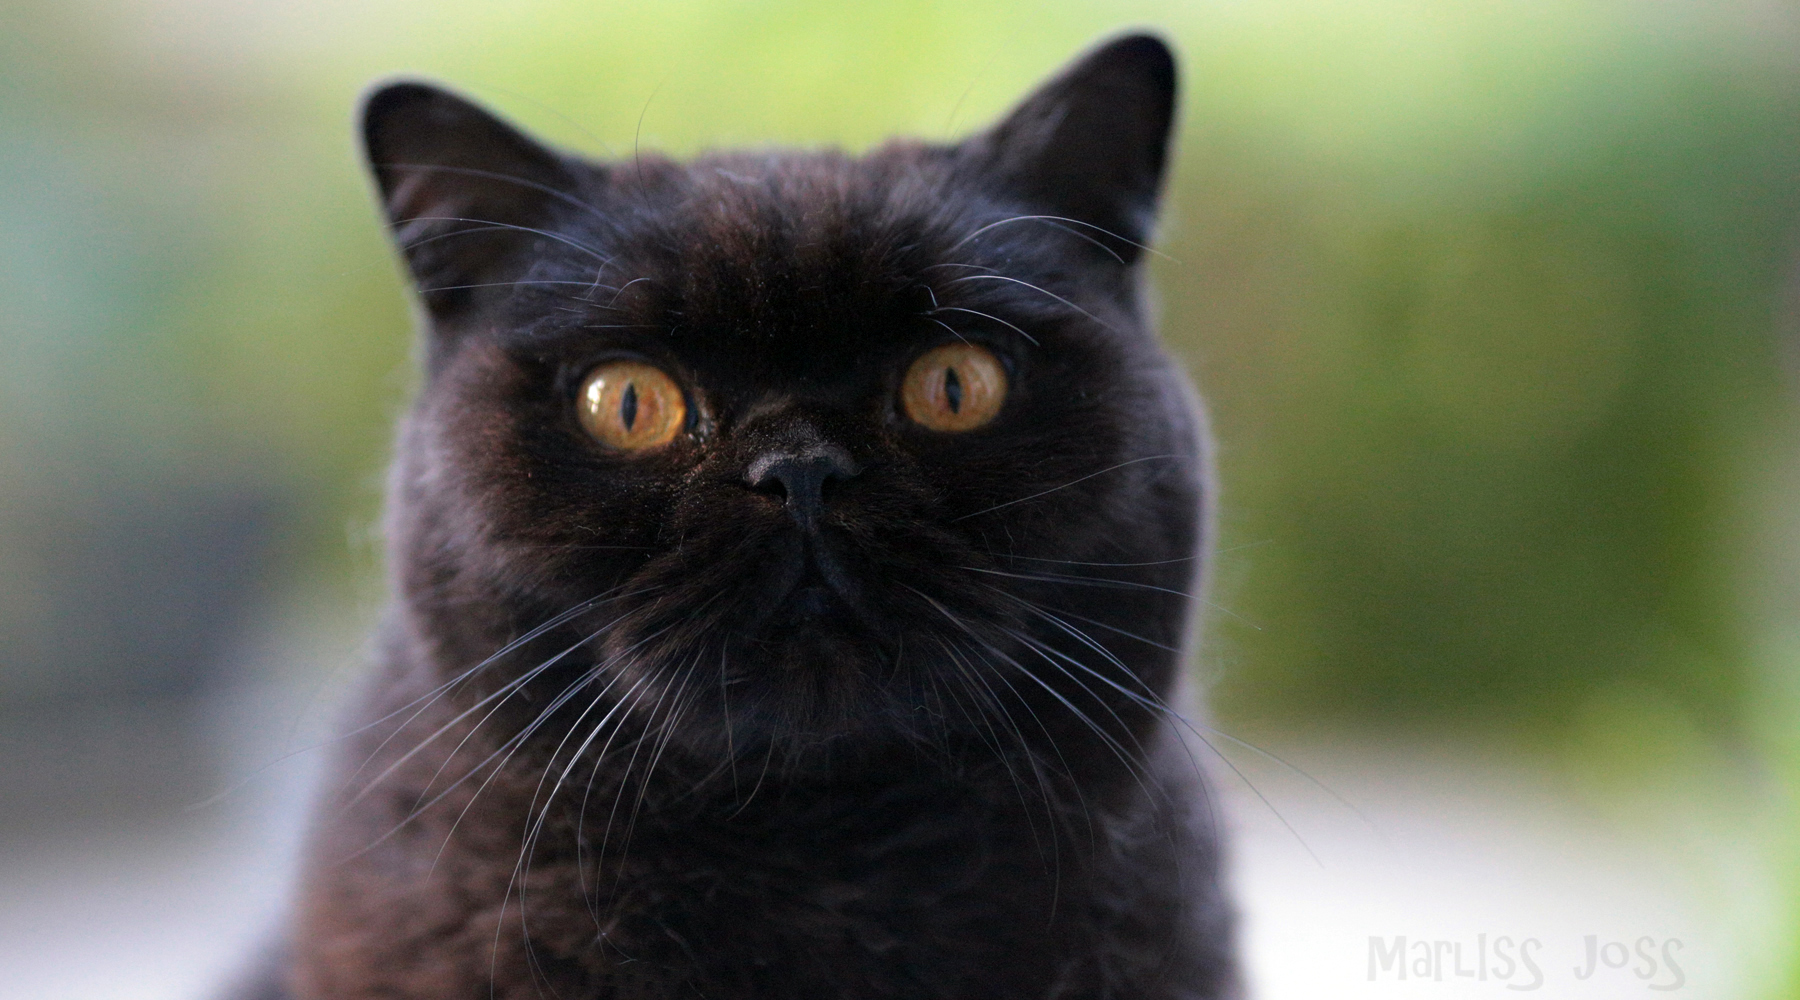 The Cat Music Video